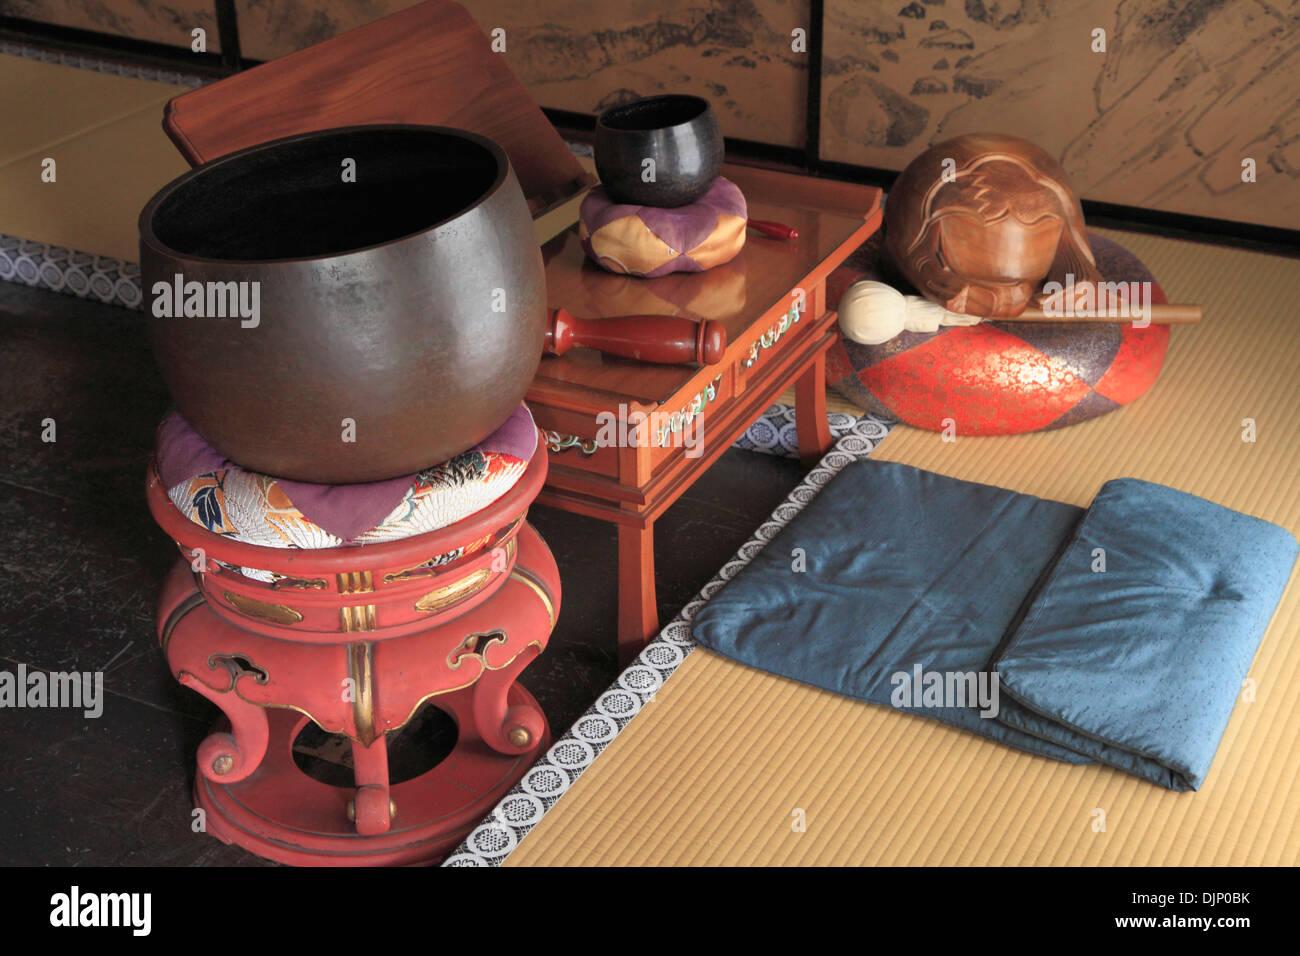 Japan, Kyoto, Daitokuji Temple, Zuiho-in, interior, prayer accessories, - Stock Image